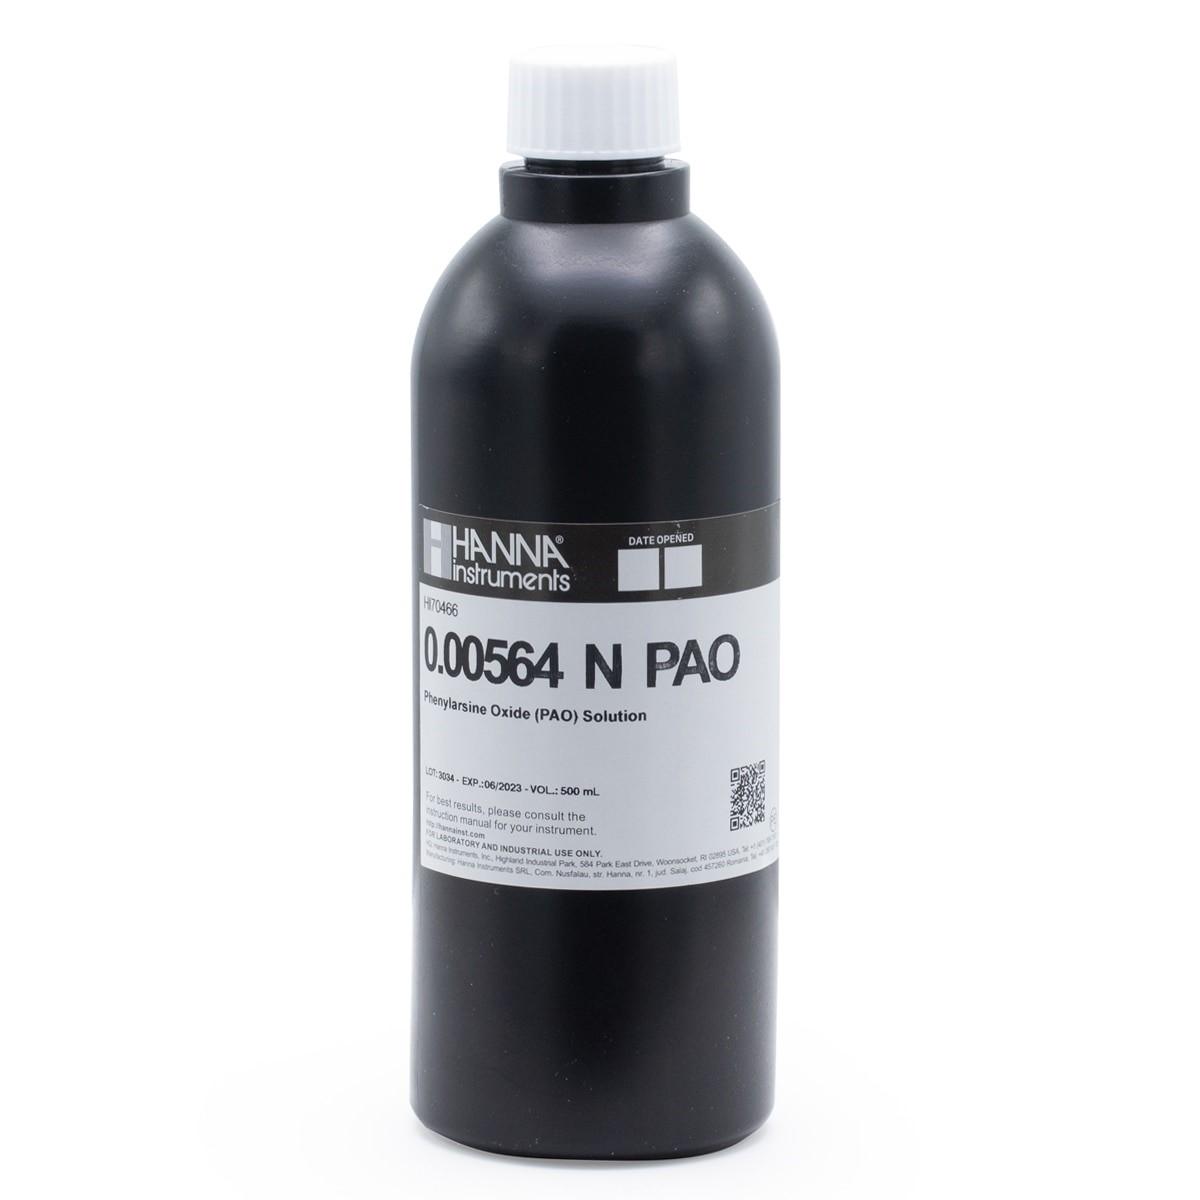 Phenylarsine Oxide (PAO) Solution (0.00564N), 500 mL - HI70466